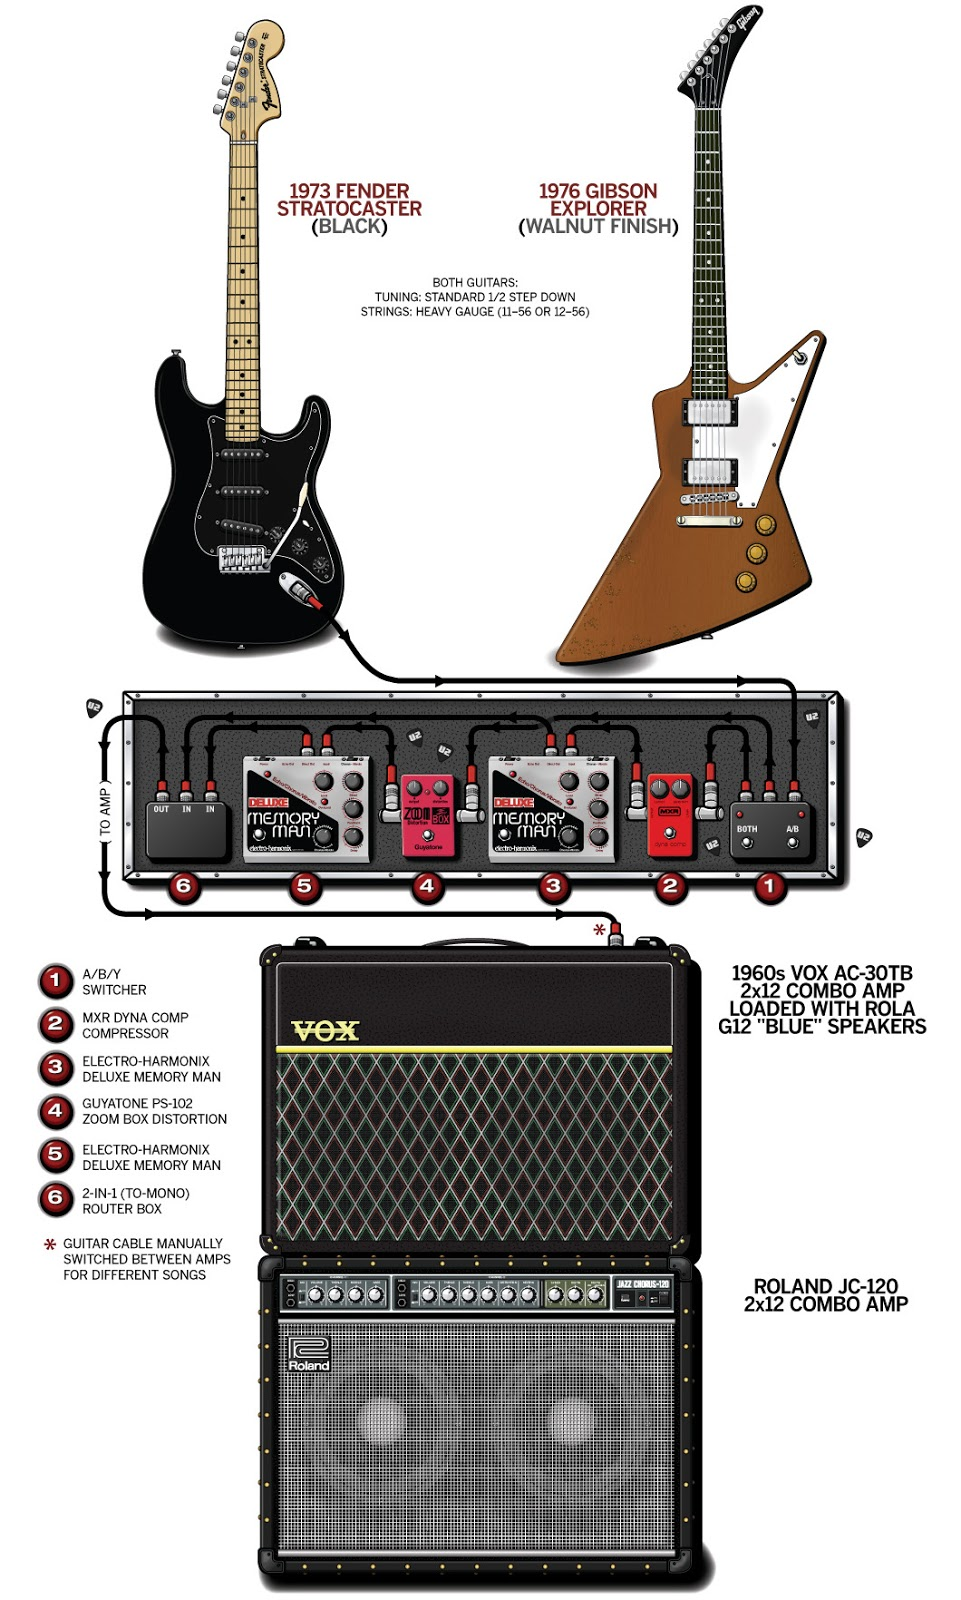 Jw Guitarworks Schematics Updated As I Find New Examples Squier Vm Surf Strat Wiring Diagram U2 The Edge Rig